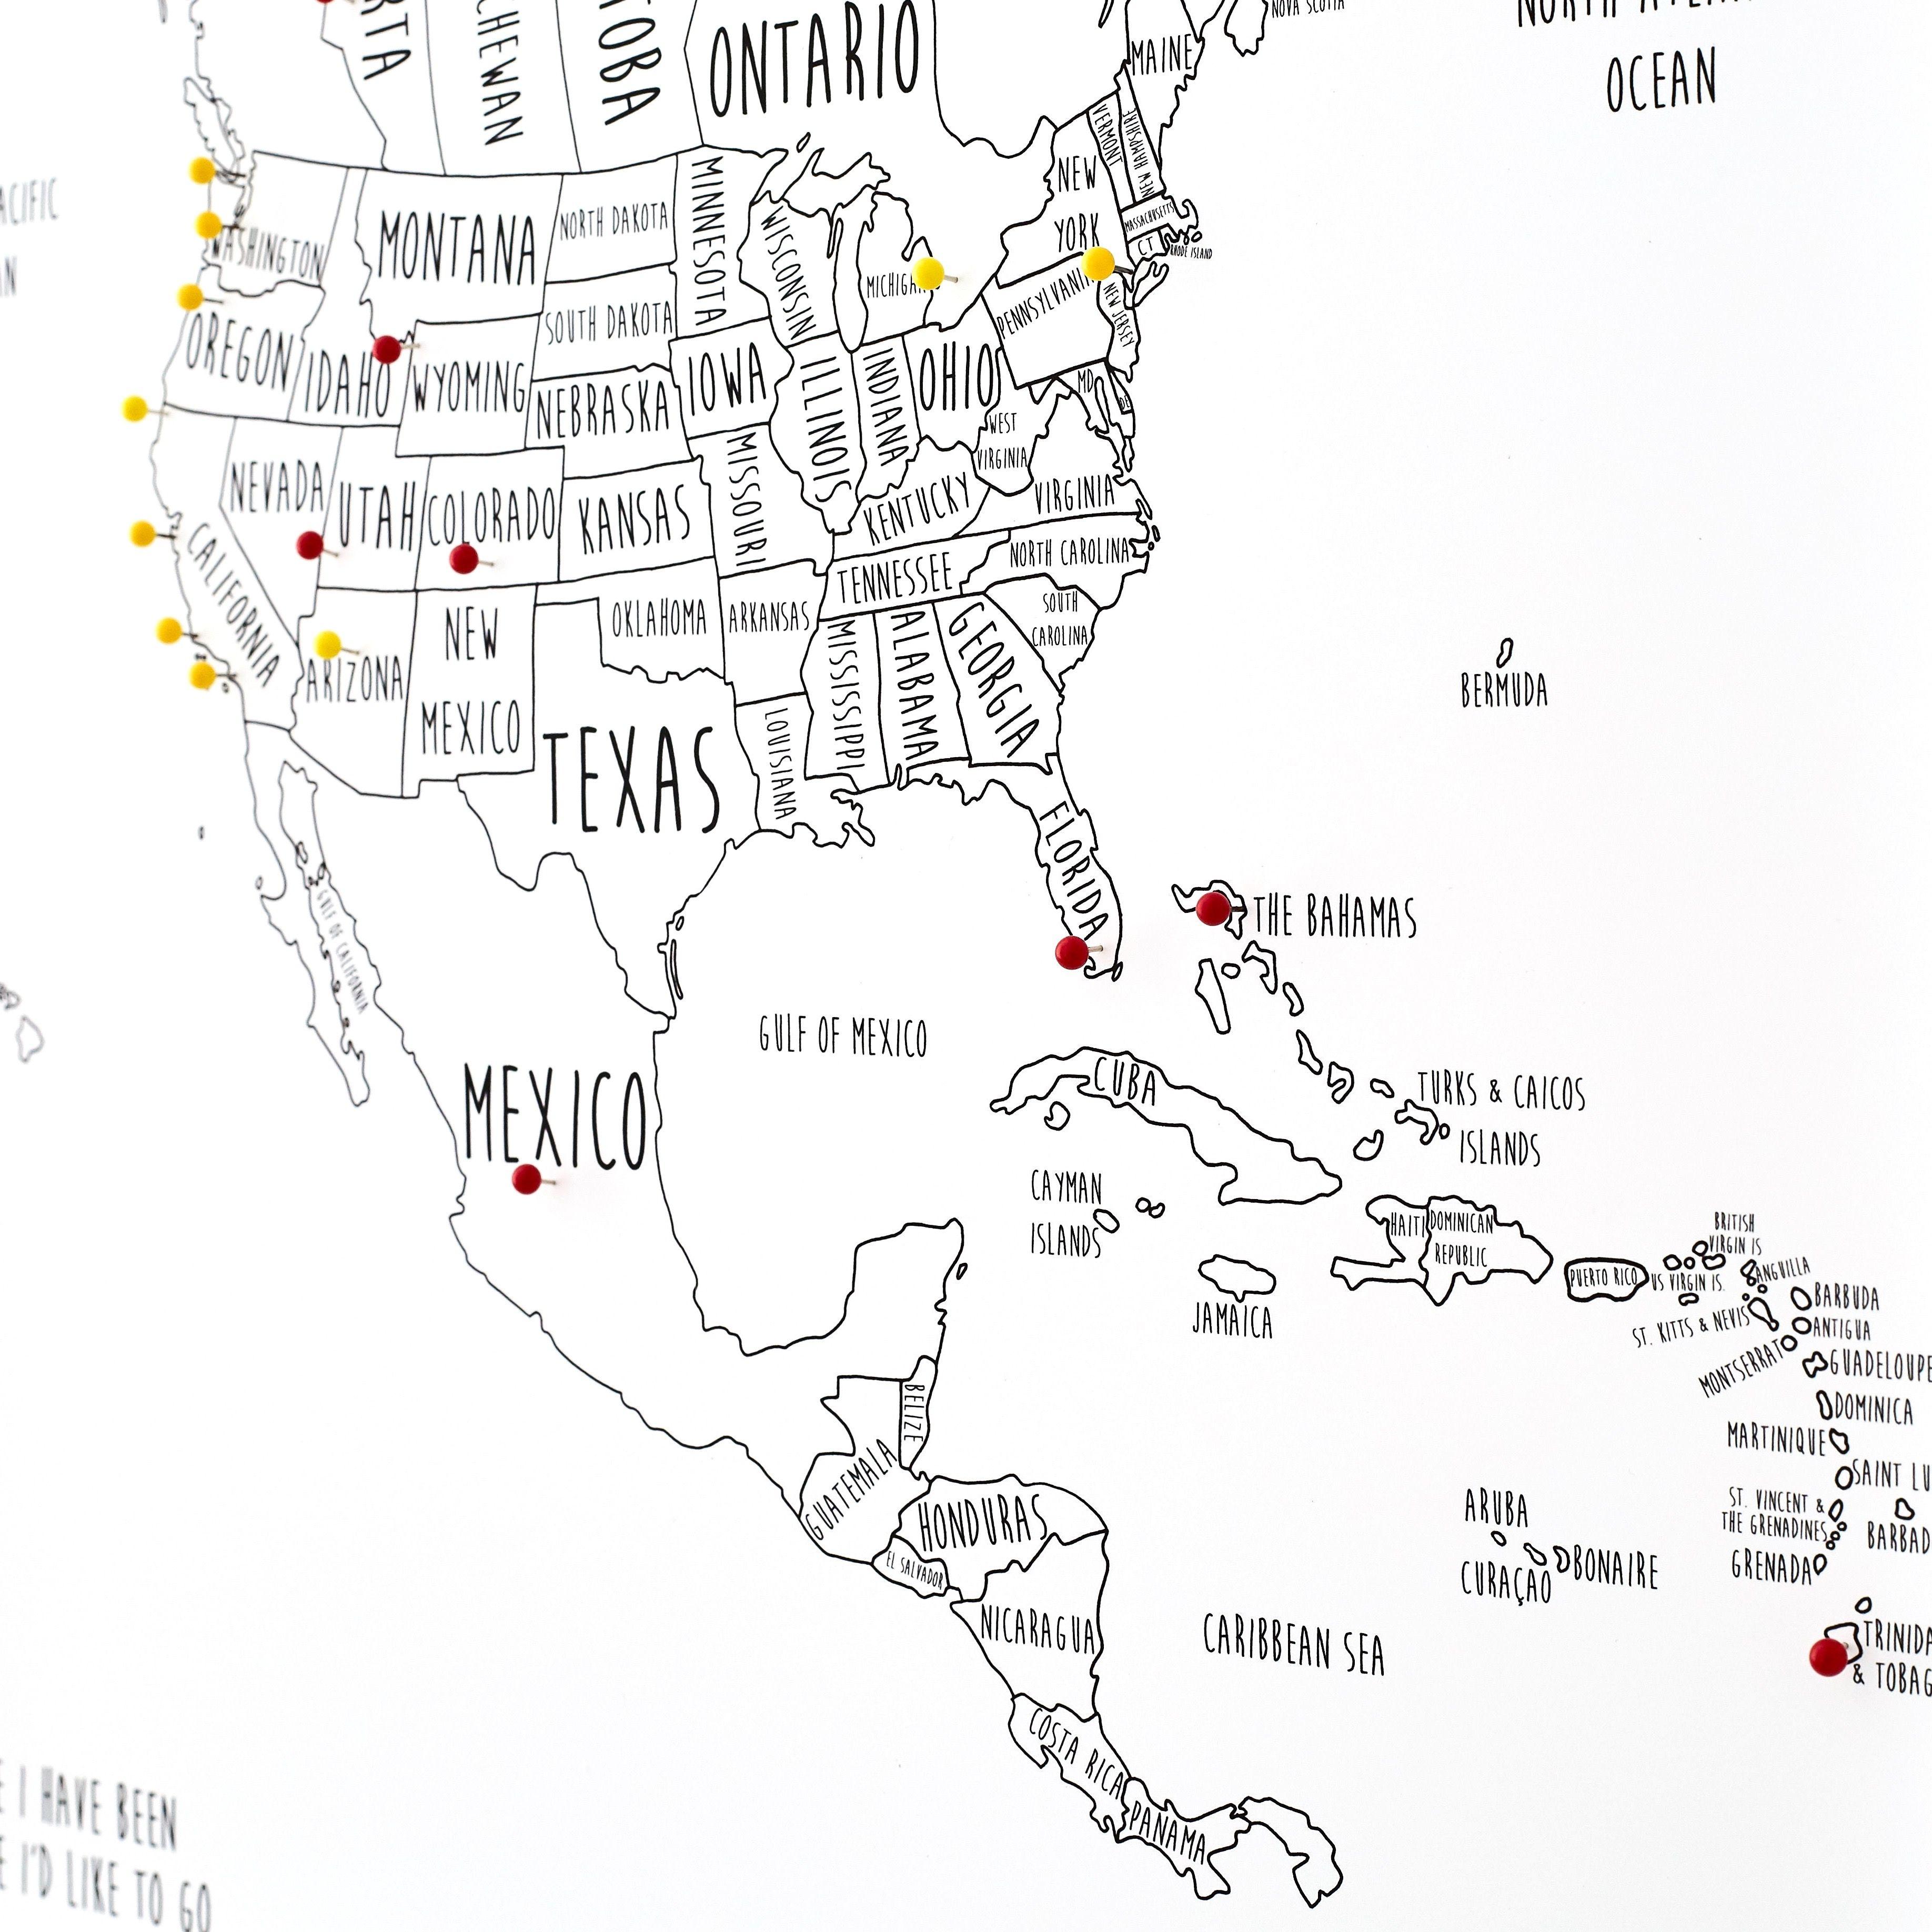 Pin by Louisa Elizabeth on Personalised Continent Travel Maps ... Zoomable Map Of Mexico on detailed map mexico, punta mita mexico, leon mexico, queretaro mexico, michoacan mexico, san carlos mexico, guadalajara mexico, oaxaca mexico, jalisco mexico, puebla mexico, manzanillo mexico, tulum mexico, chiapas mexico, huatulco mexico, aguascalientes mexico, taxco mexico, cities in mexico, sinaloa mexico, nayarit mexico, mazatlan mexico,